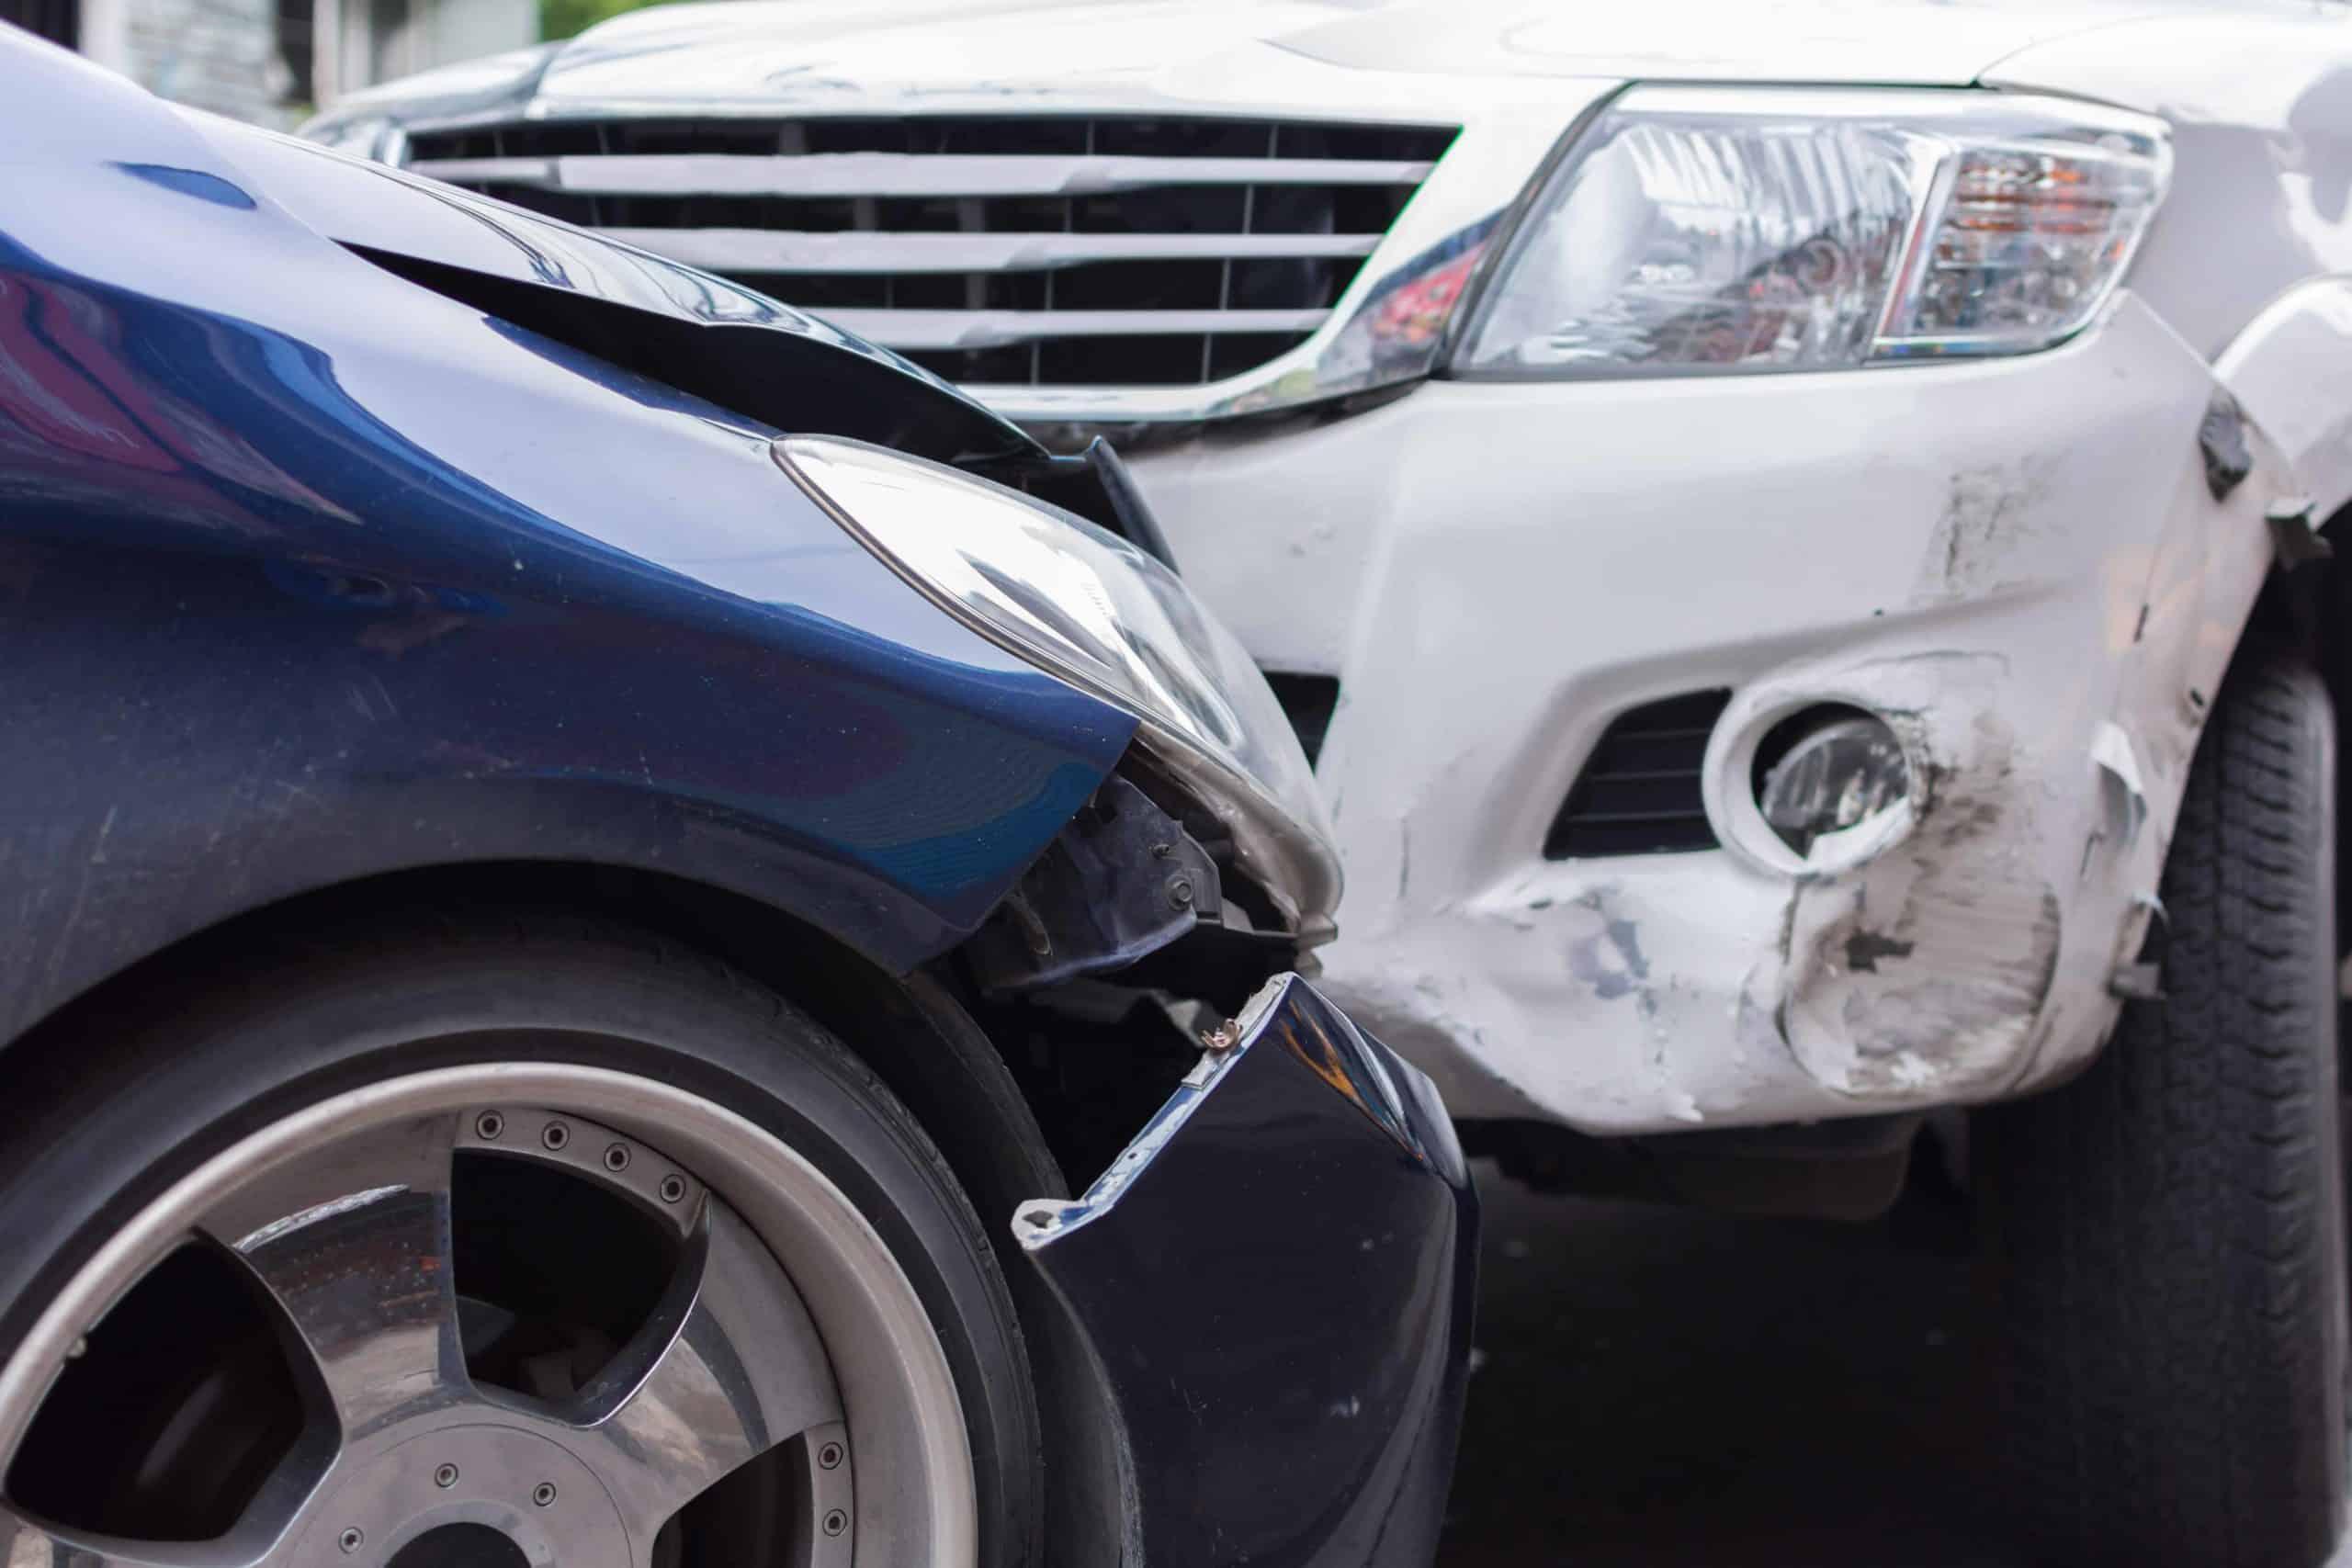 1 Person Dead in Vehicle Crash on Otay Mesa Road [Otay Mesa, CA]